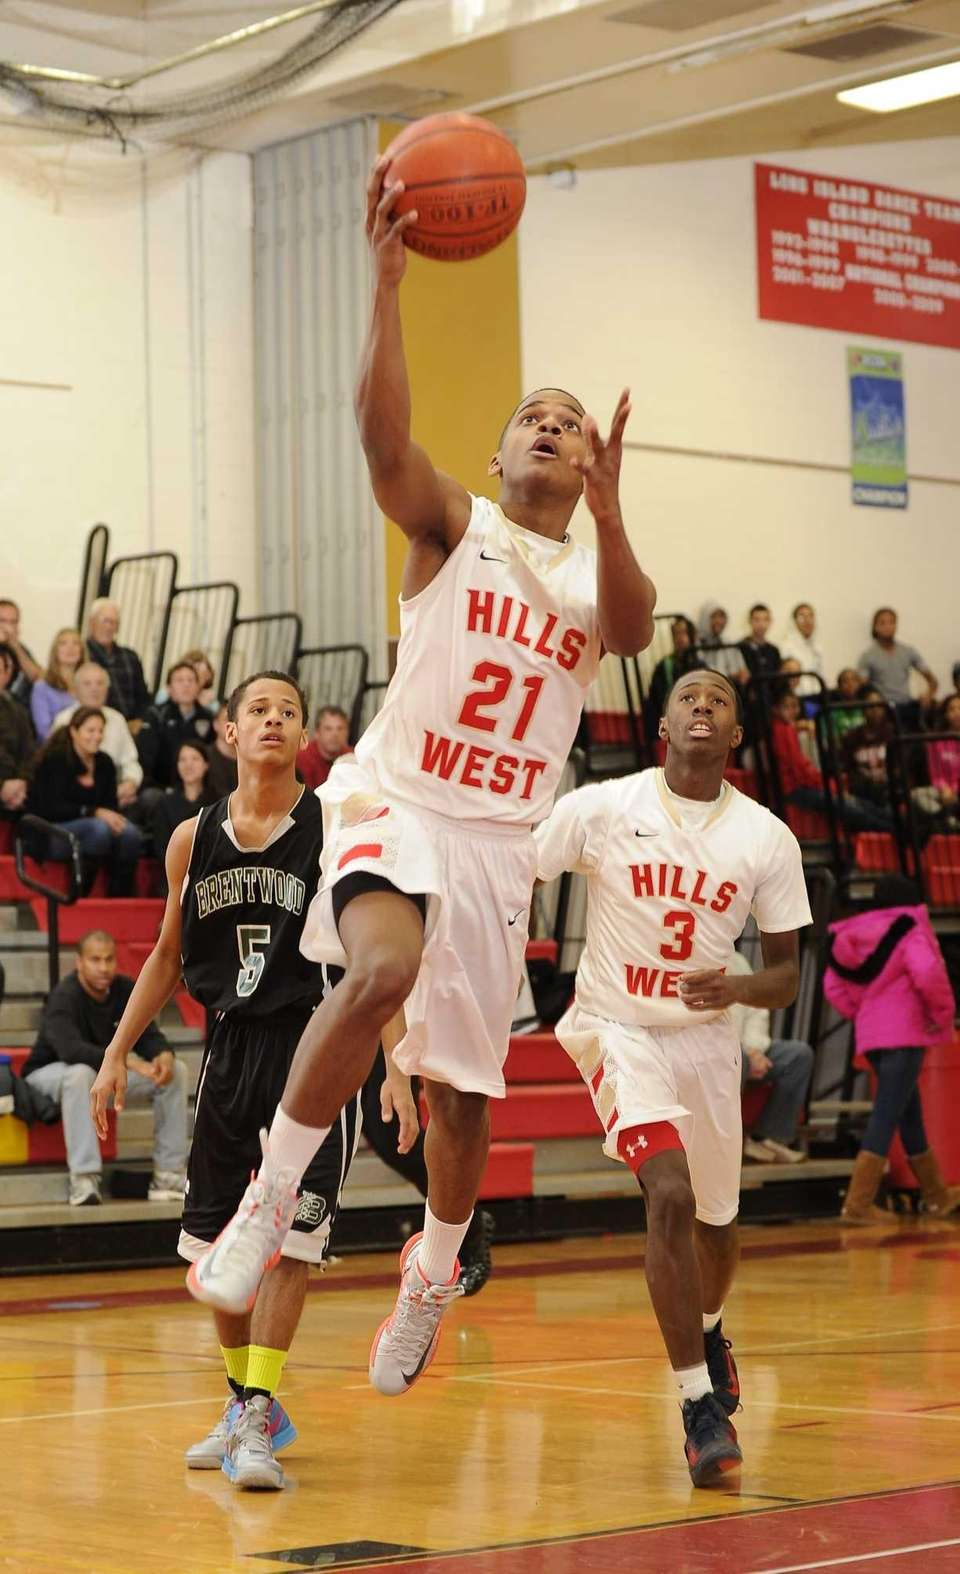 Half Hollow Hills West guard Jamir Blackman shoots